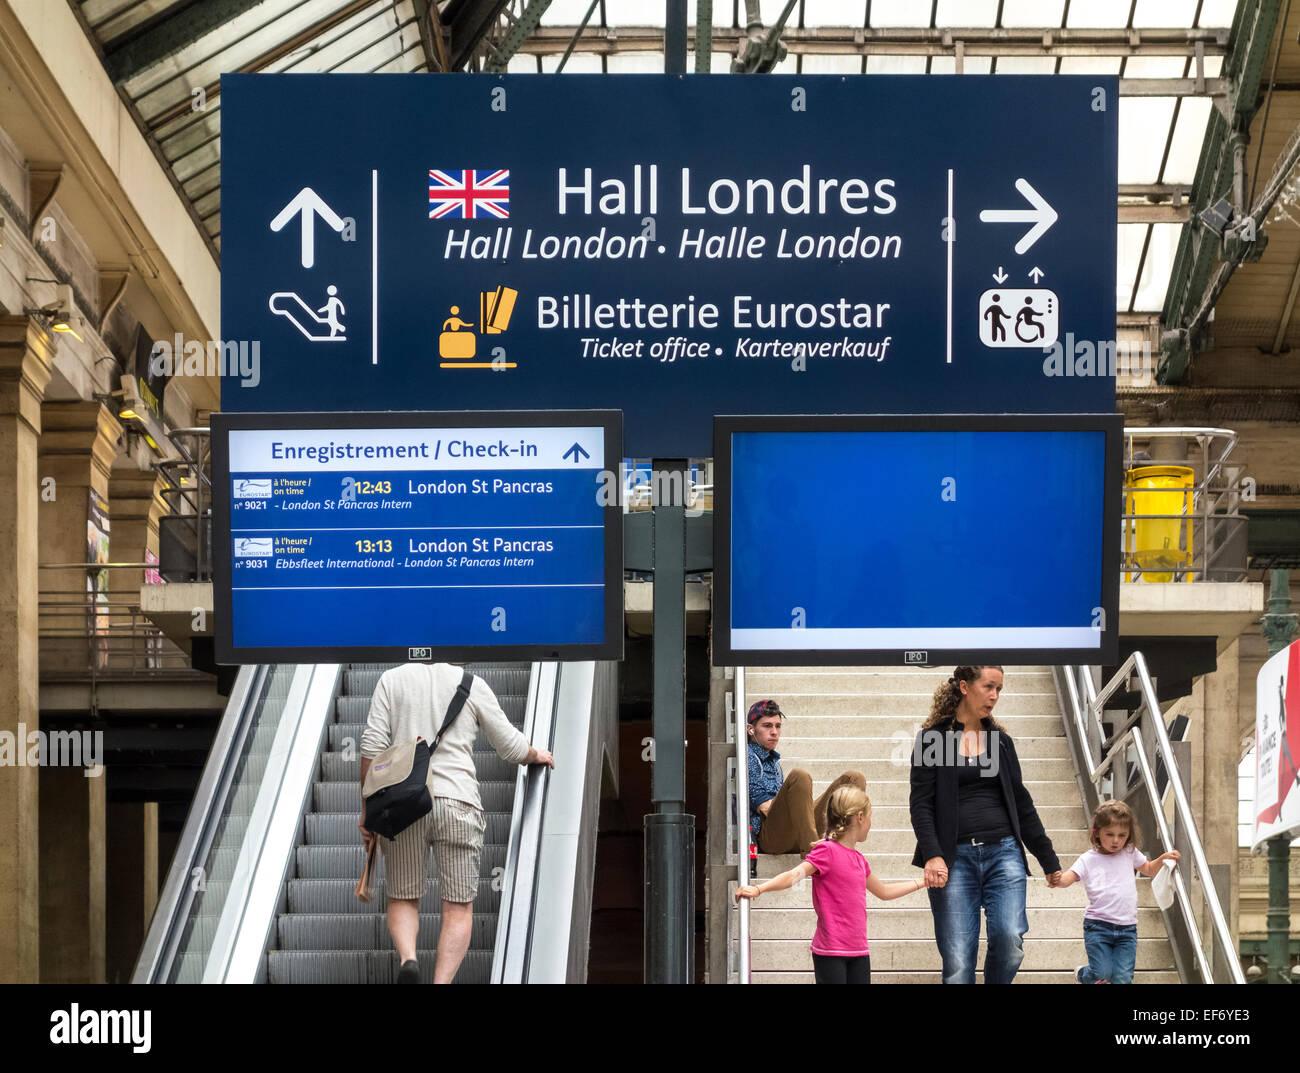 https://c7.alamy.com/comp/EF6YE3/paris-gare-du-nord-station-with-travelers-under-sign-pointing-to-paris-EF6YE3.jpg